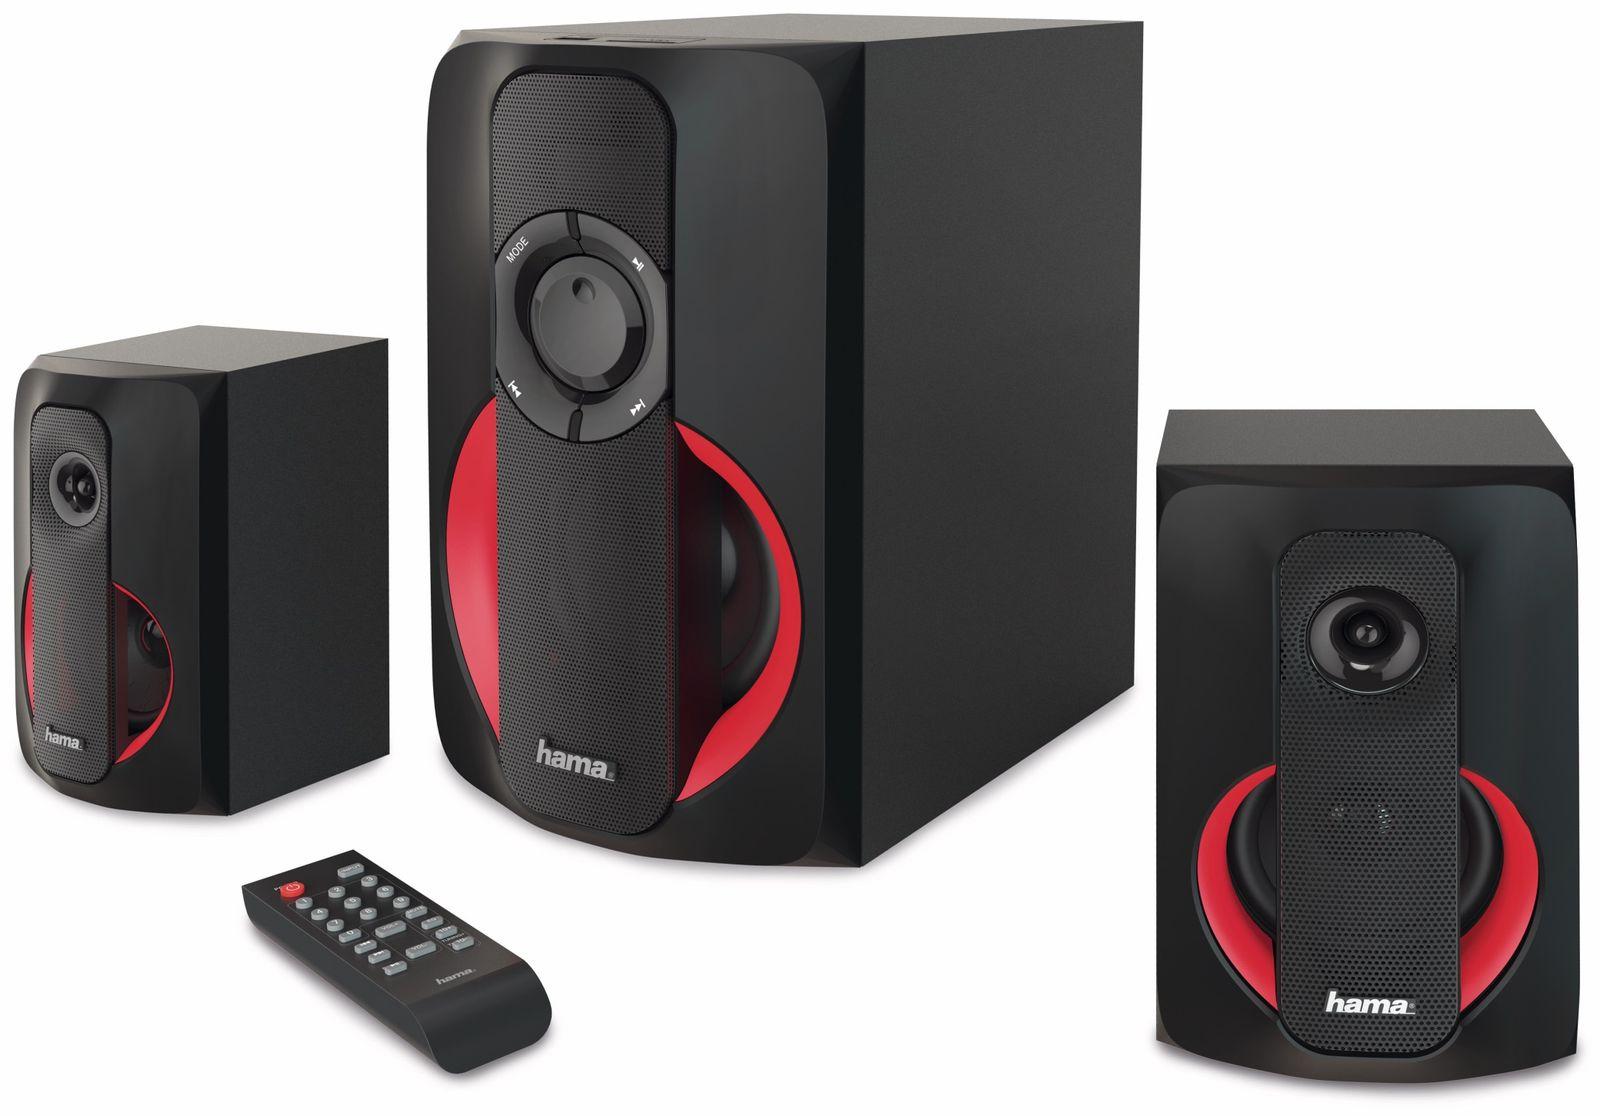 2 1 soundsystem hama pr 2180 80 w schwarz rot 2 1 soundsystem hama pr 2180 4047443341723 ebay. Black Bedroom Furniture Sets. Home Design Ideas